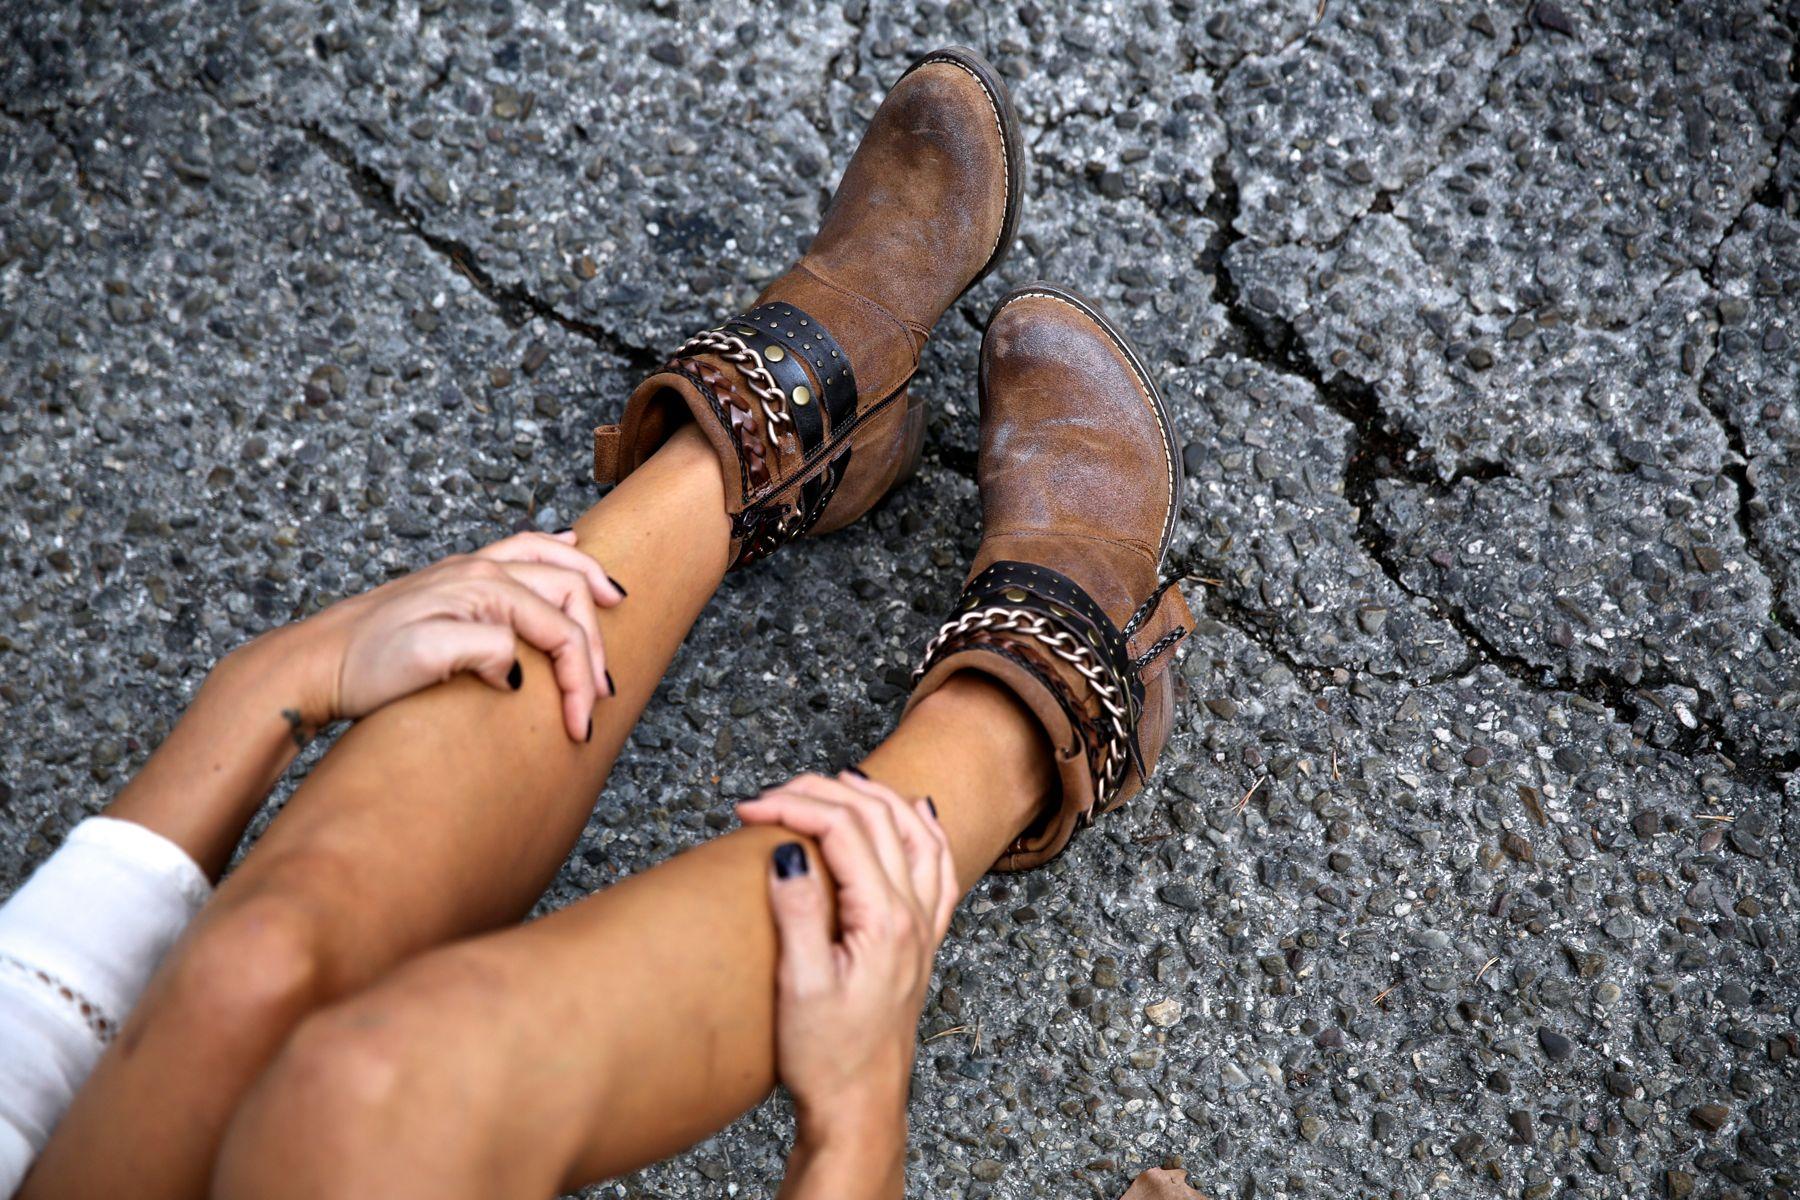 trendy_taste-look-outfit-street_style-ootd-blog-blogger-fashion_spain-moda_españa-boho-hippie-flecos-botines_camperos-cowboy_booties-mochila-backpack-blusa-camisa-denim-shorts-vaqueros-7